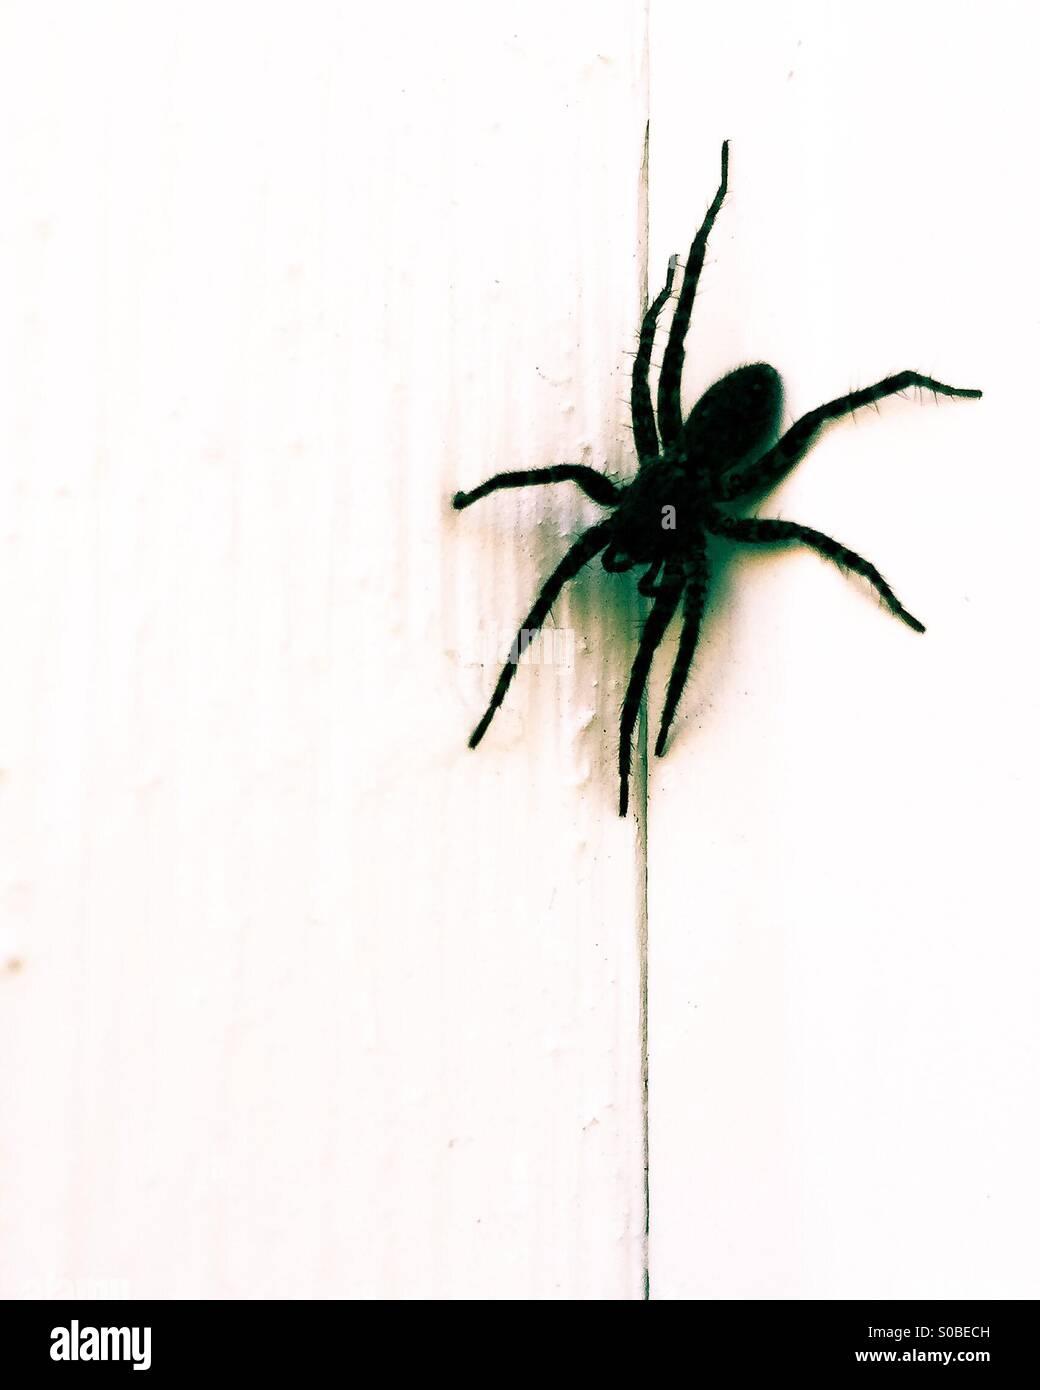 Schwarzer Wolf Spinne. Stockbild